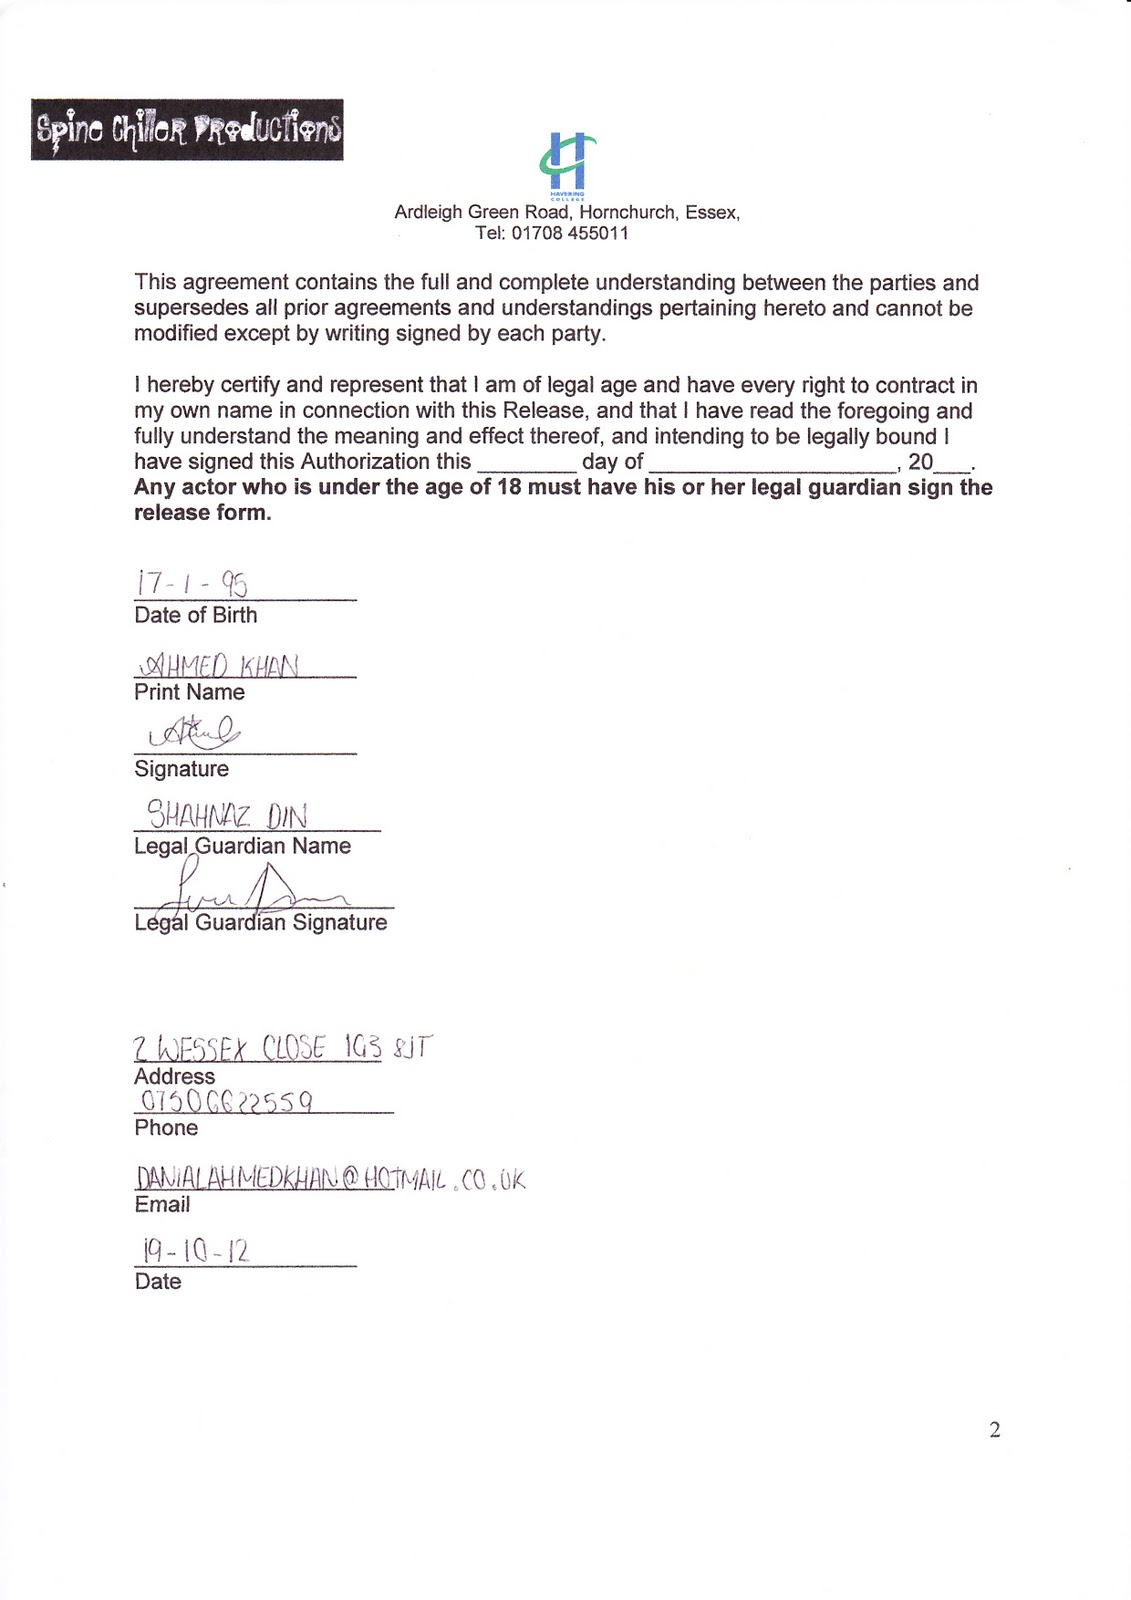 AS Media Studies Foundation Portfolio Unit G321 Actor Release – Actor Release Forms